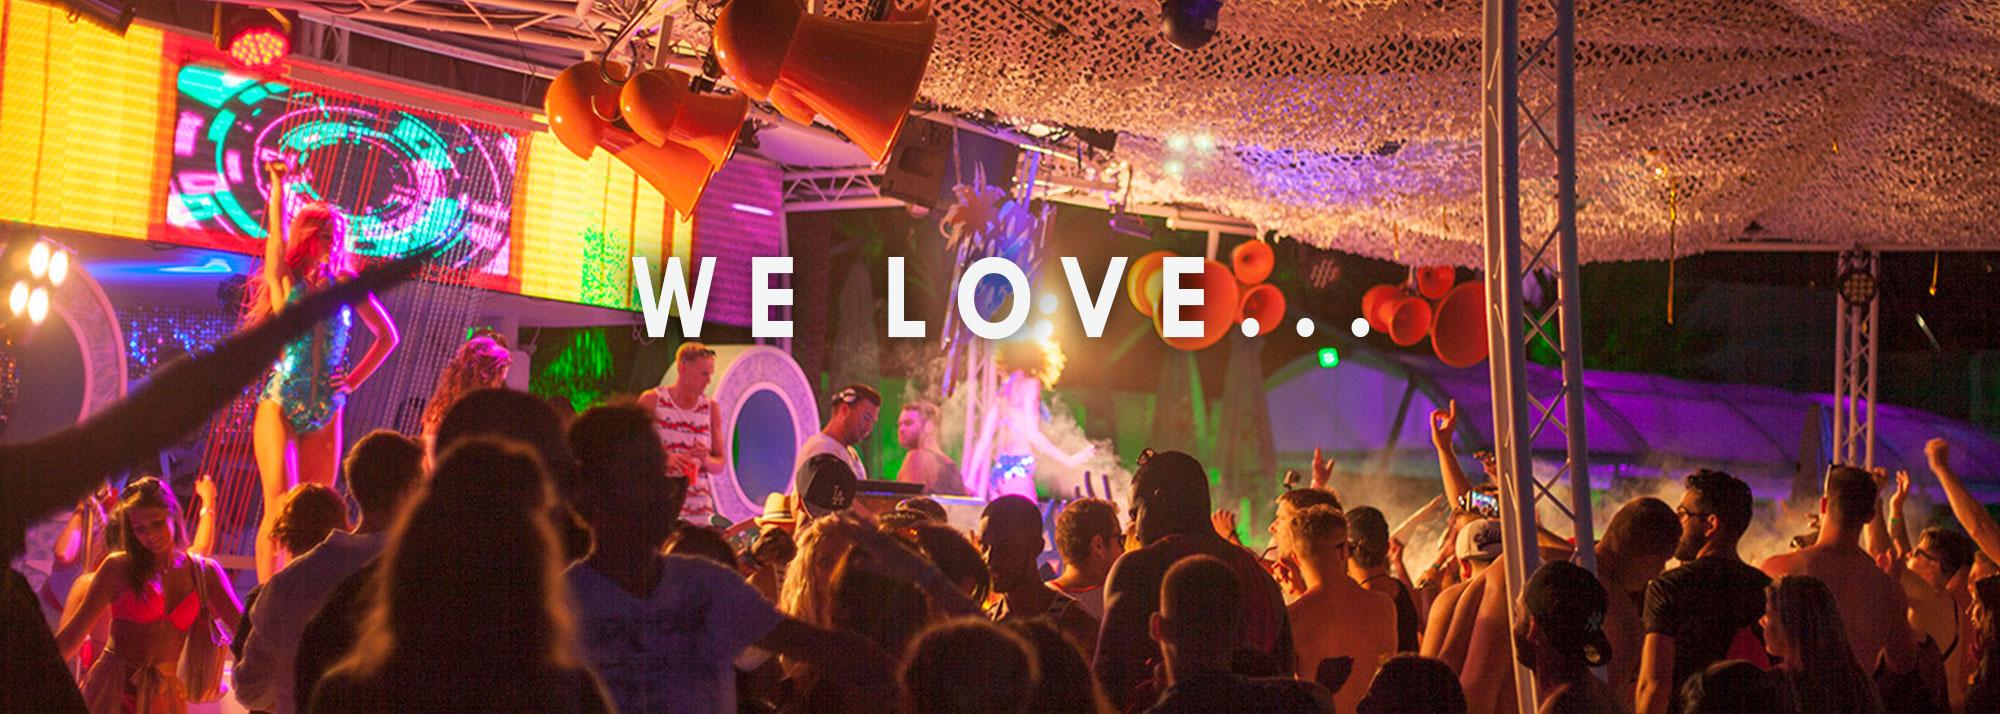 We Love …